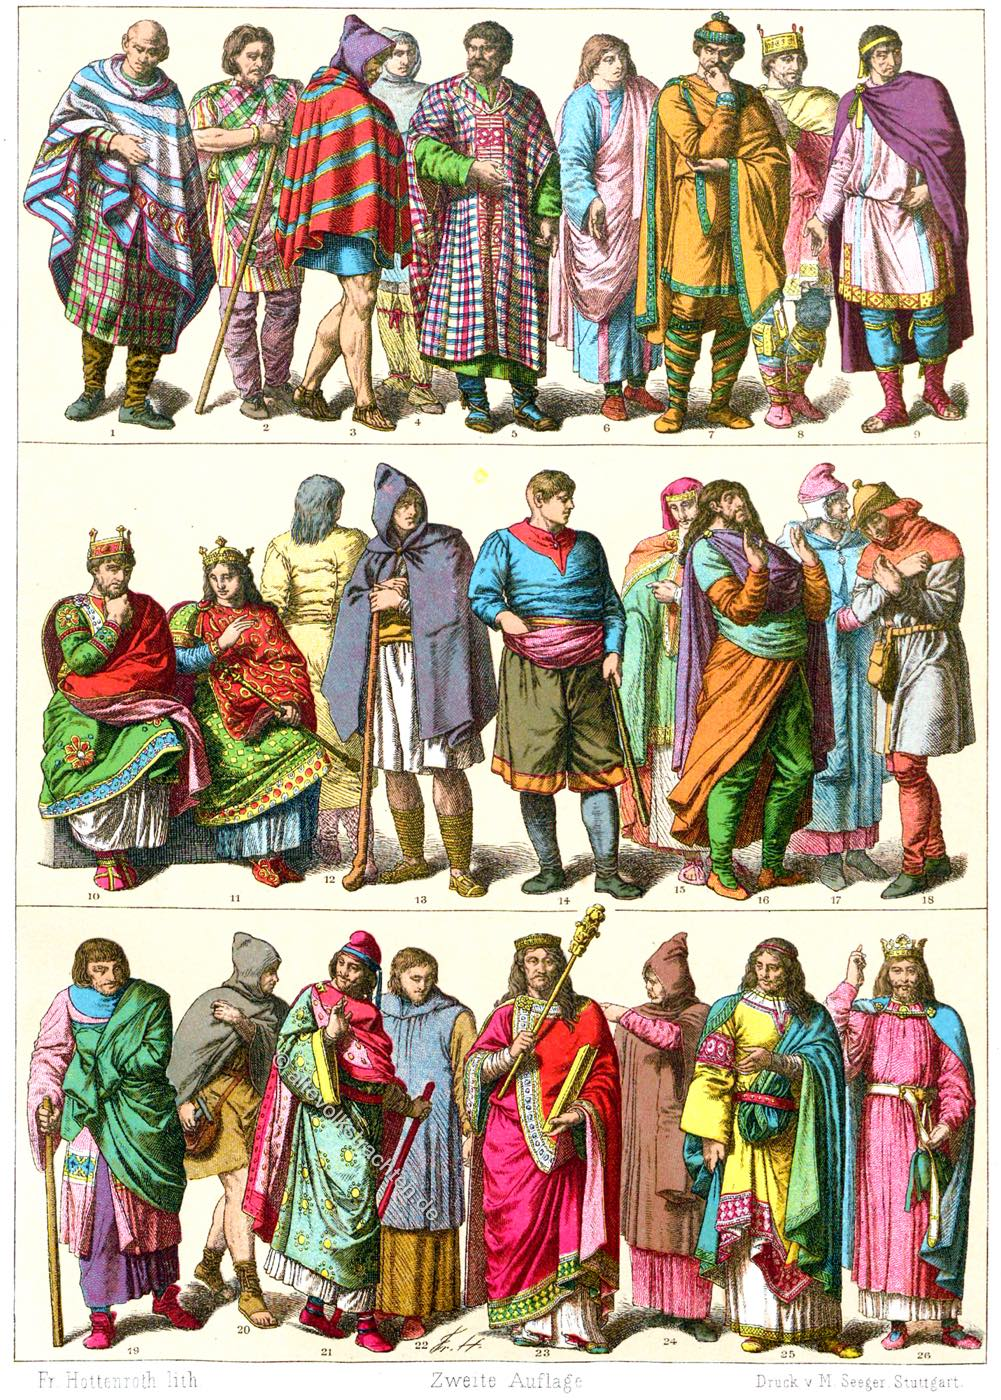 Gewandung, Karolinger, Mittelalter, Franzosen, Herrscherornat, Karolingerzeit, Friedrich Hottenroth